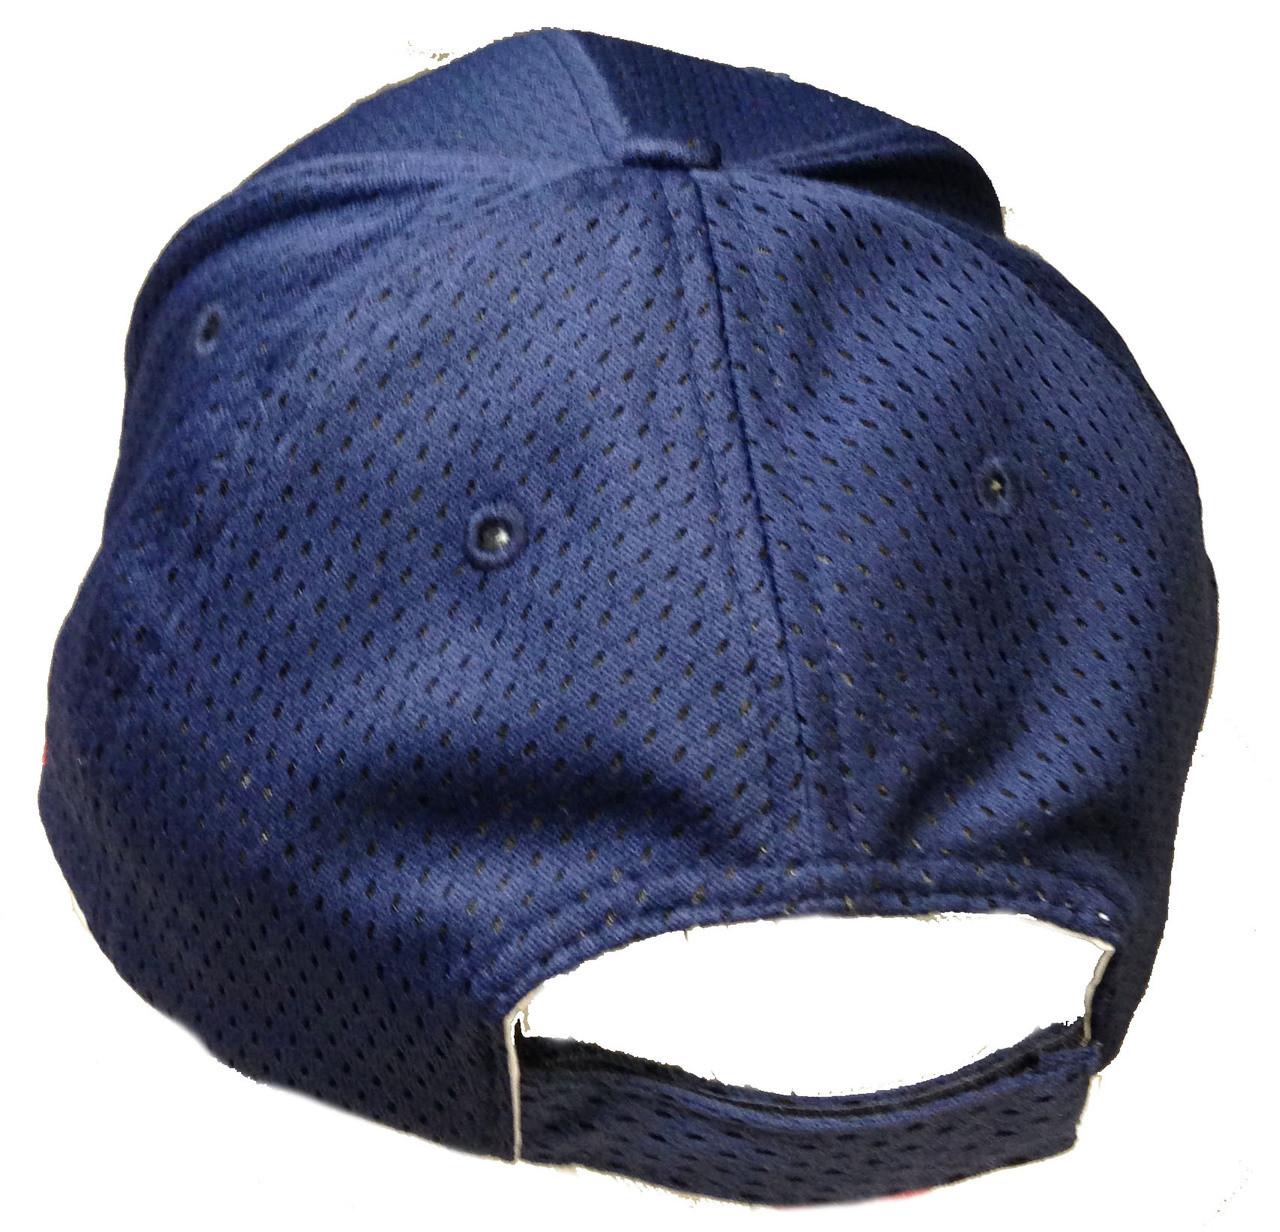 Umpire Hat - Back